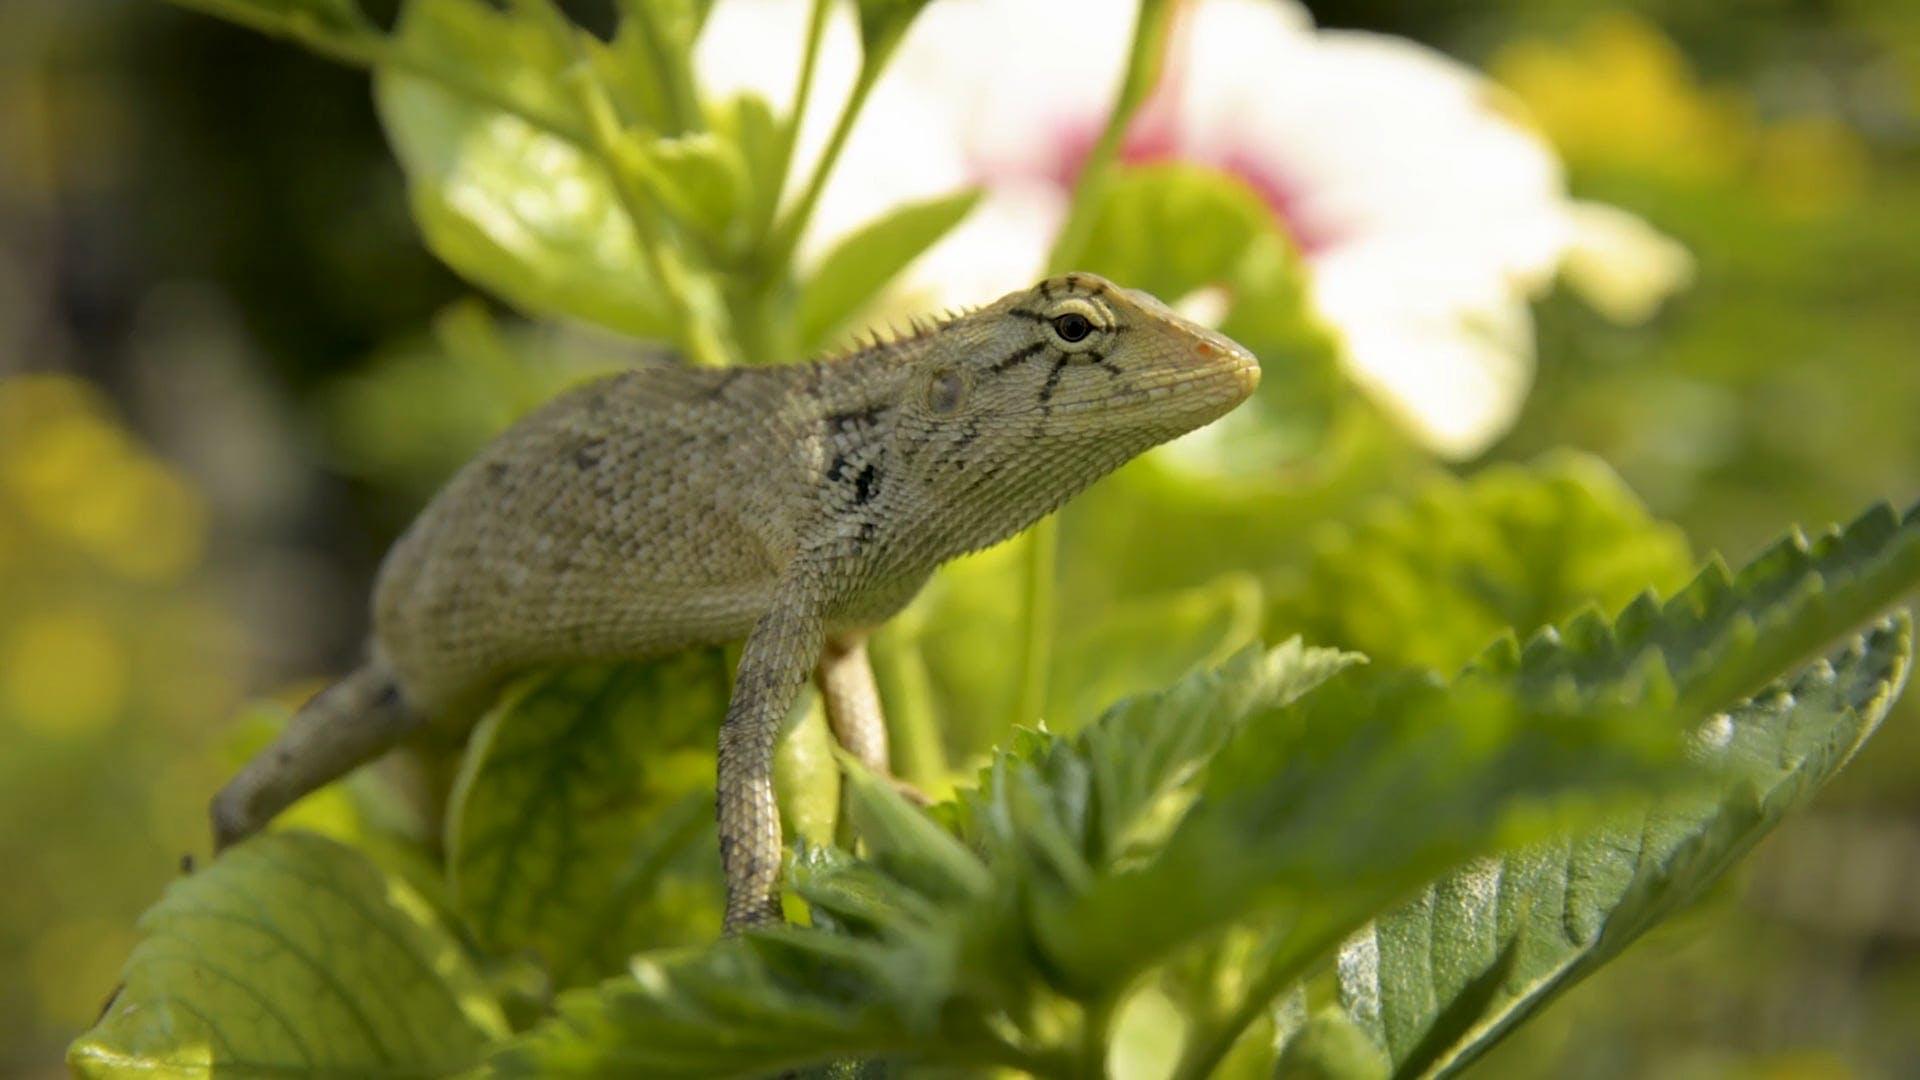 Lizard On Green Leaves